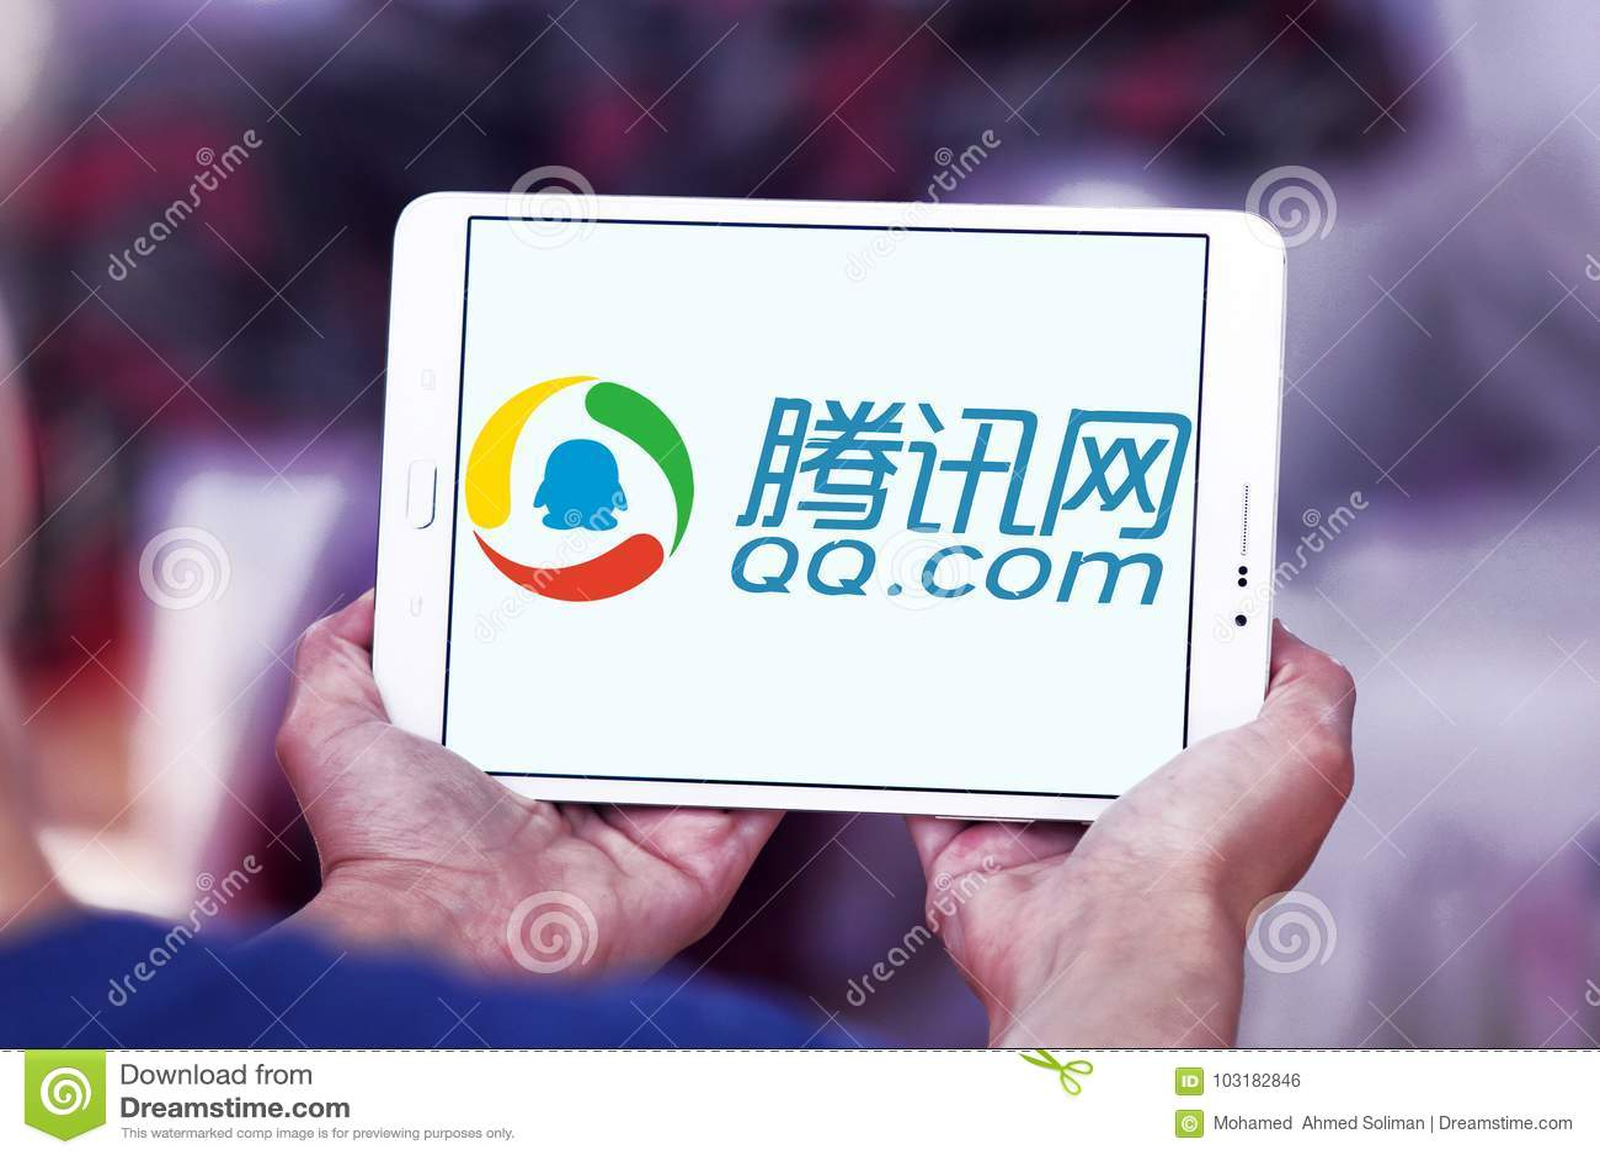 Qq Com Logo Editorial Photo Image Of Online Illustrative 103182846